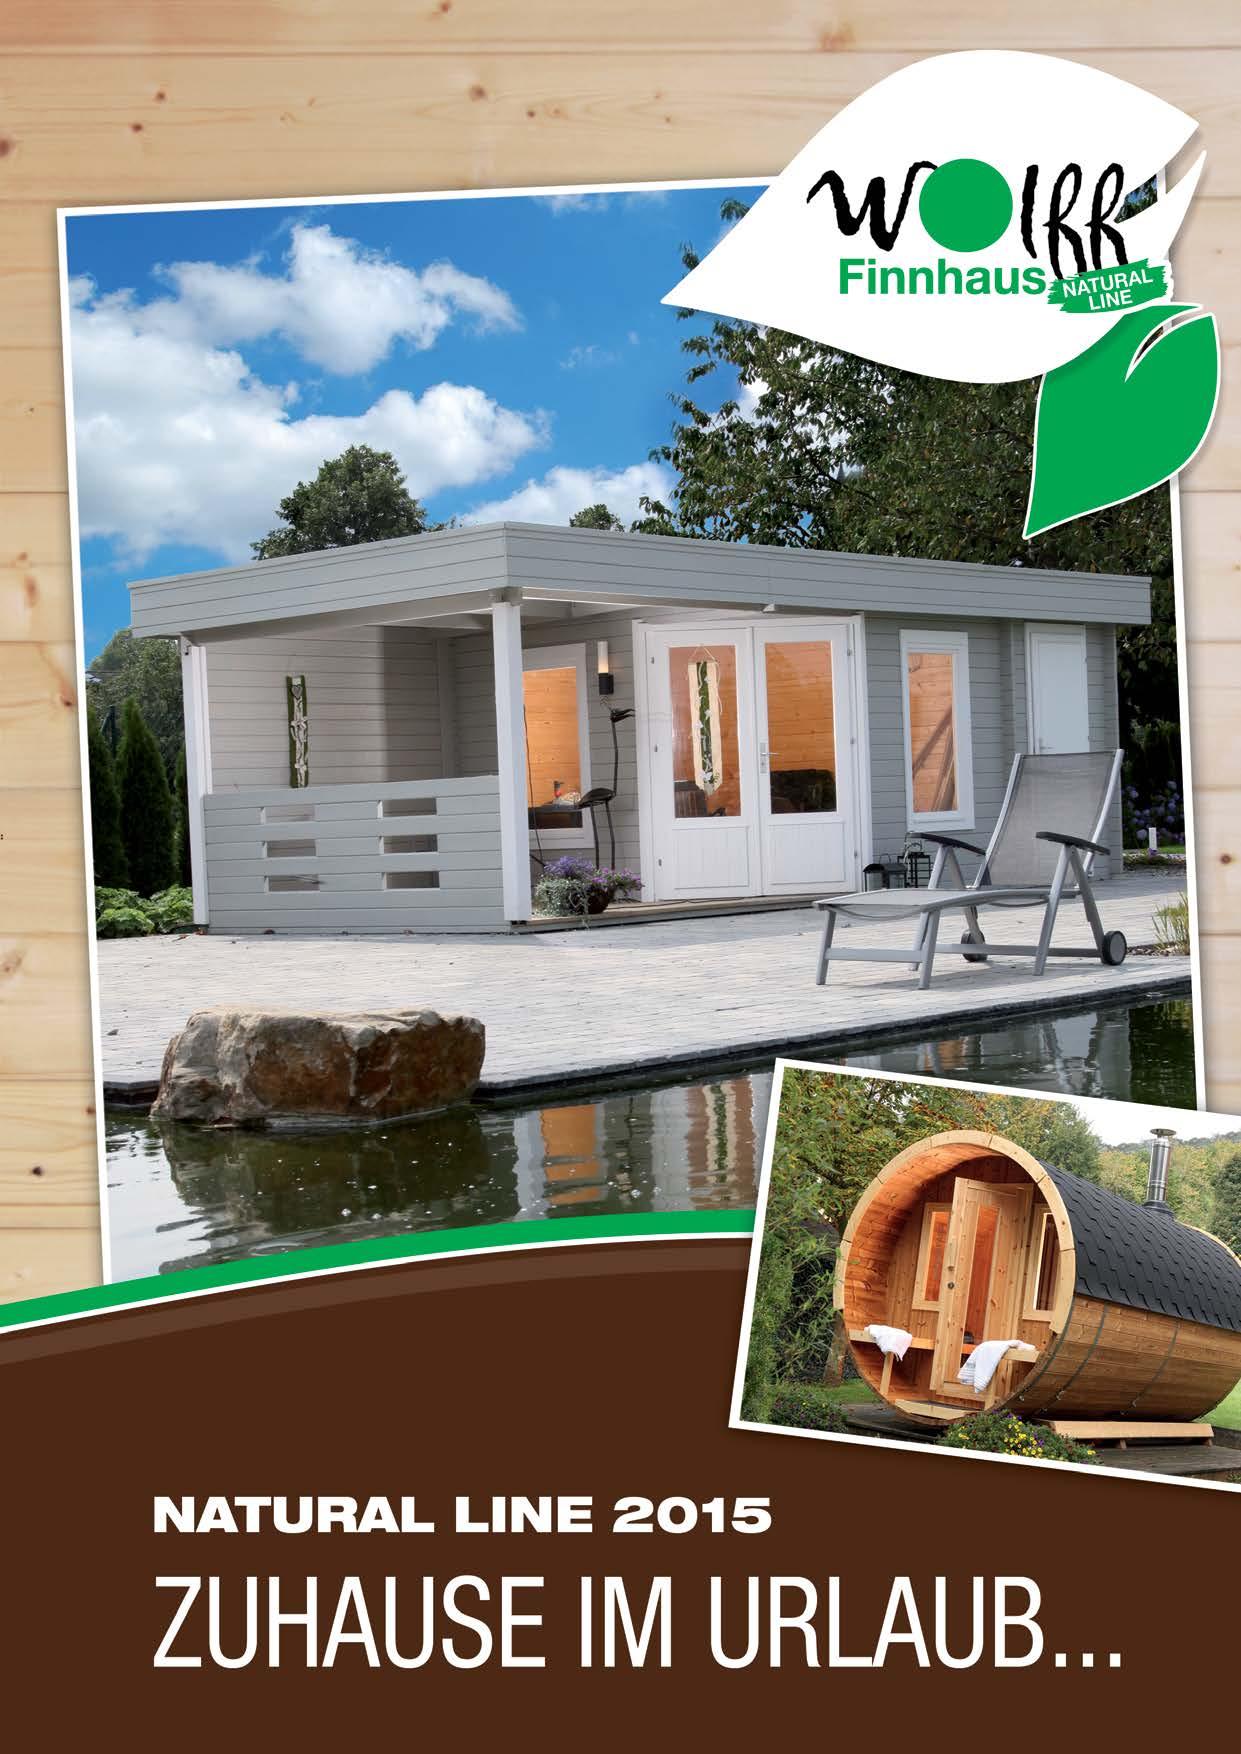 laminat parkett innent ren terrasse haina kloster marburg homberg edersee online kataloge. Black Bedroom Furniture Sets. Home Design Ideas